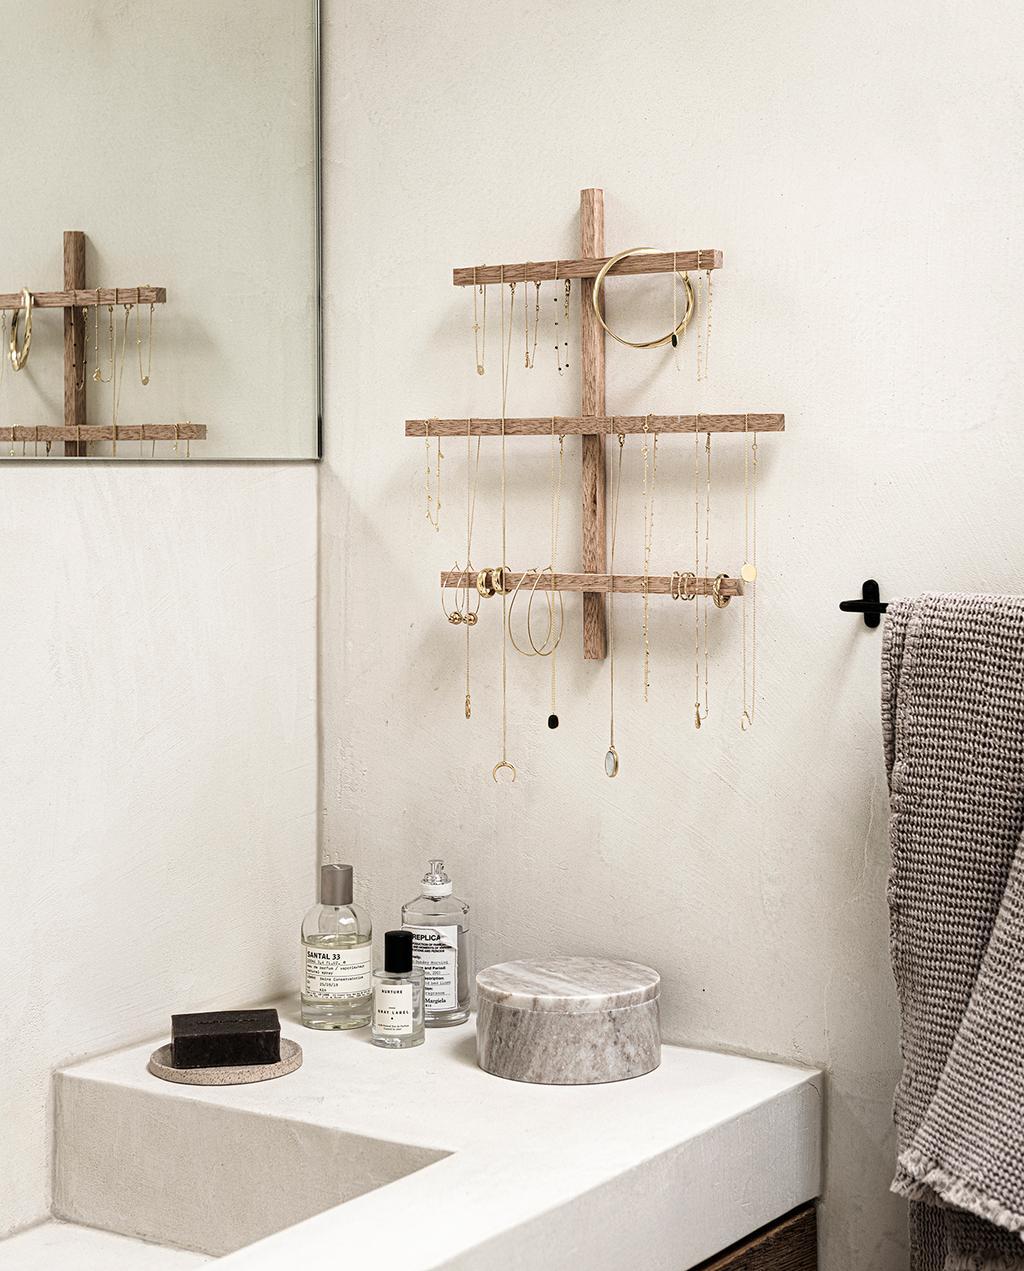 vtwonen 2020 DIY special 01   sieradenopbergers gedecoreerde badkamer